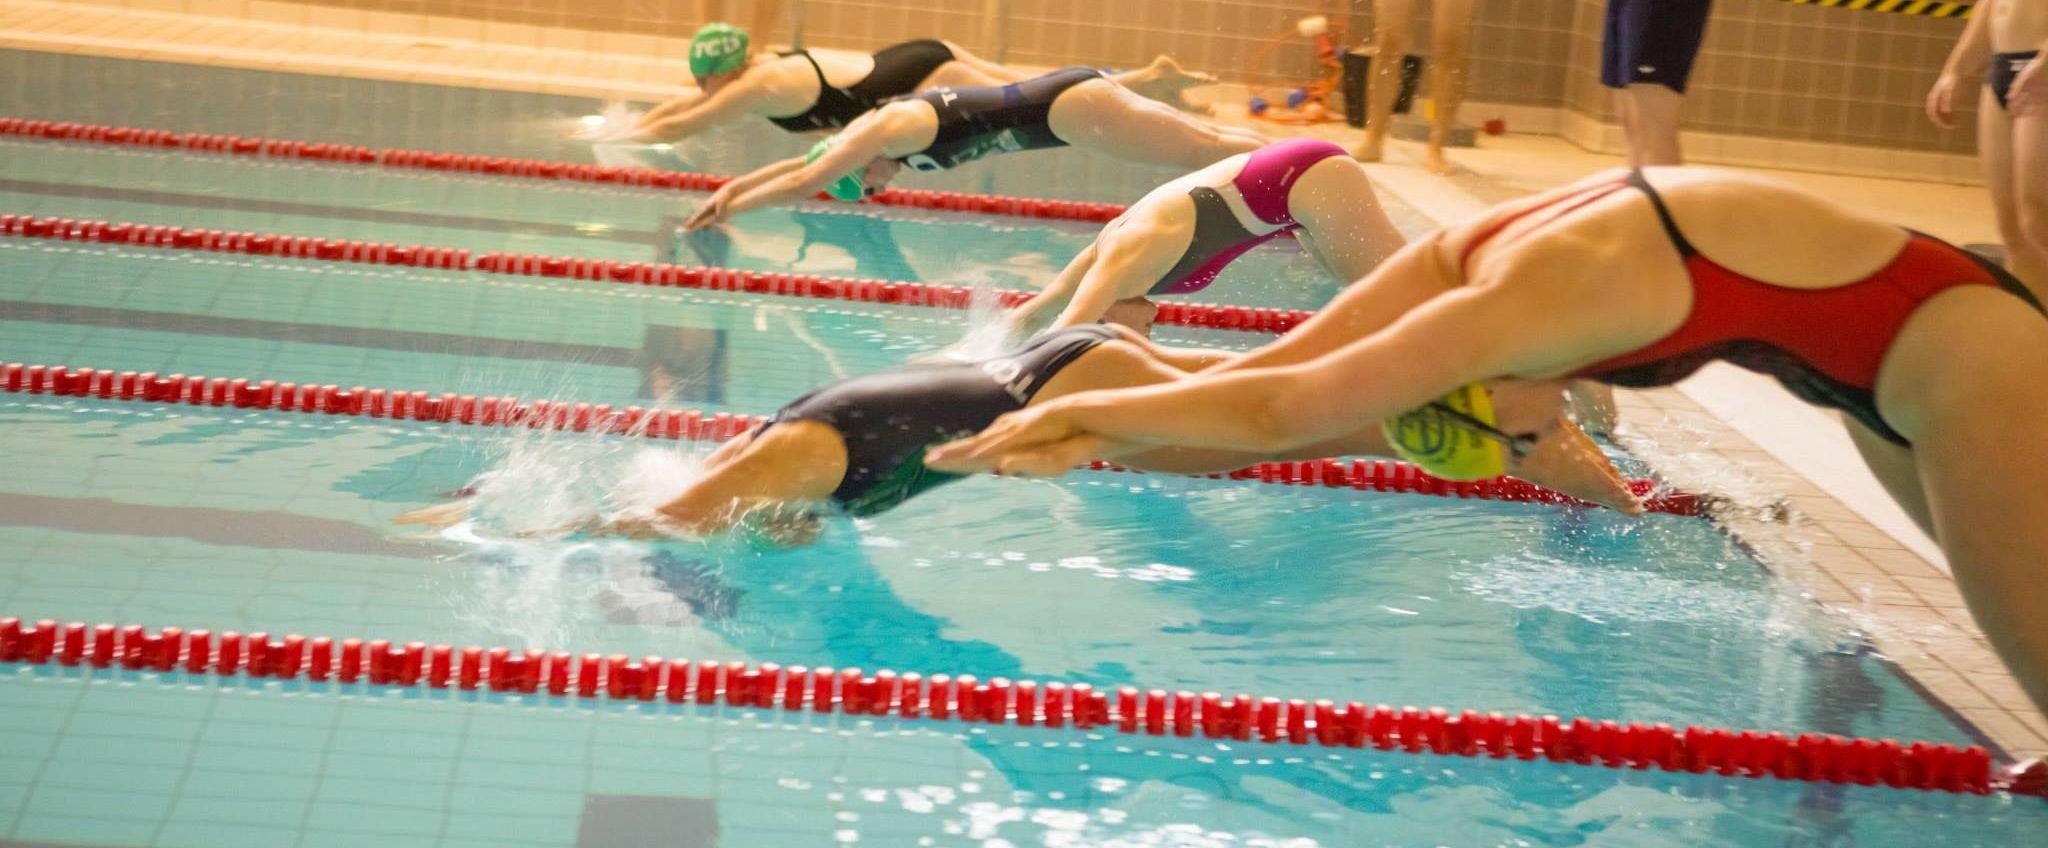 Dublin University Swimming Club Dusc Trinity College Dublin Ireland